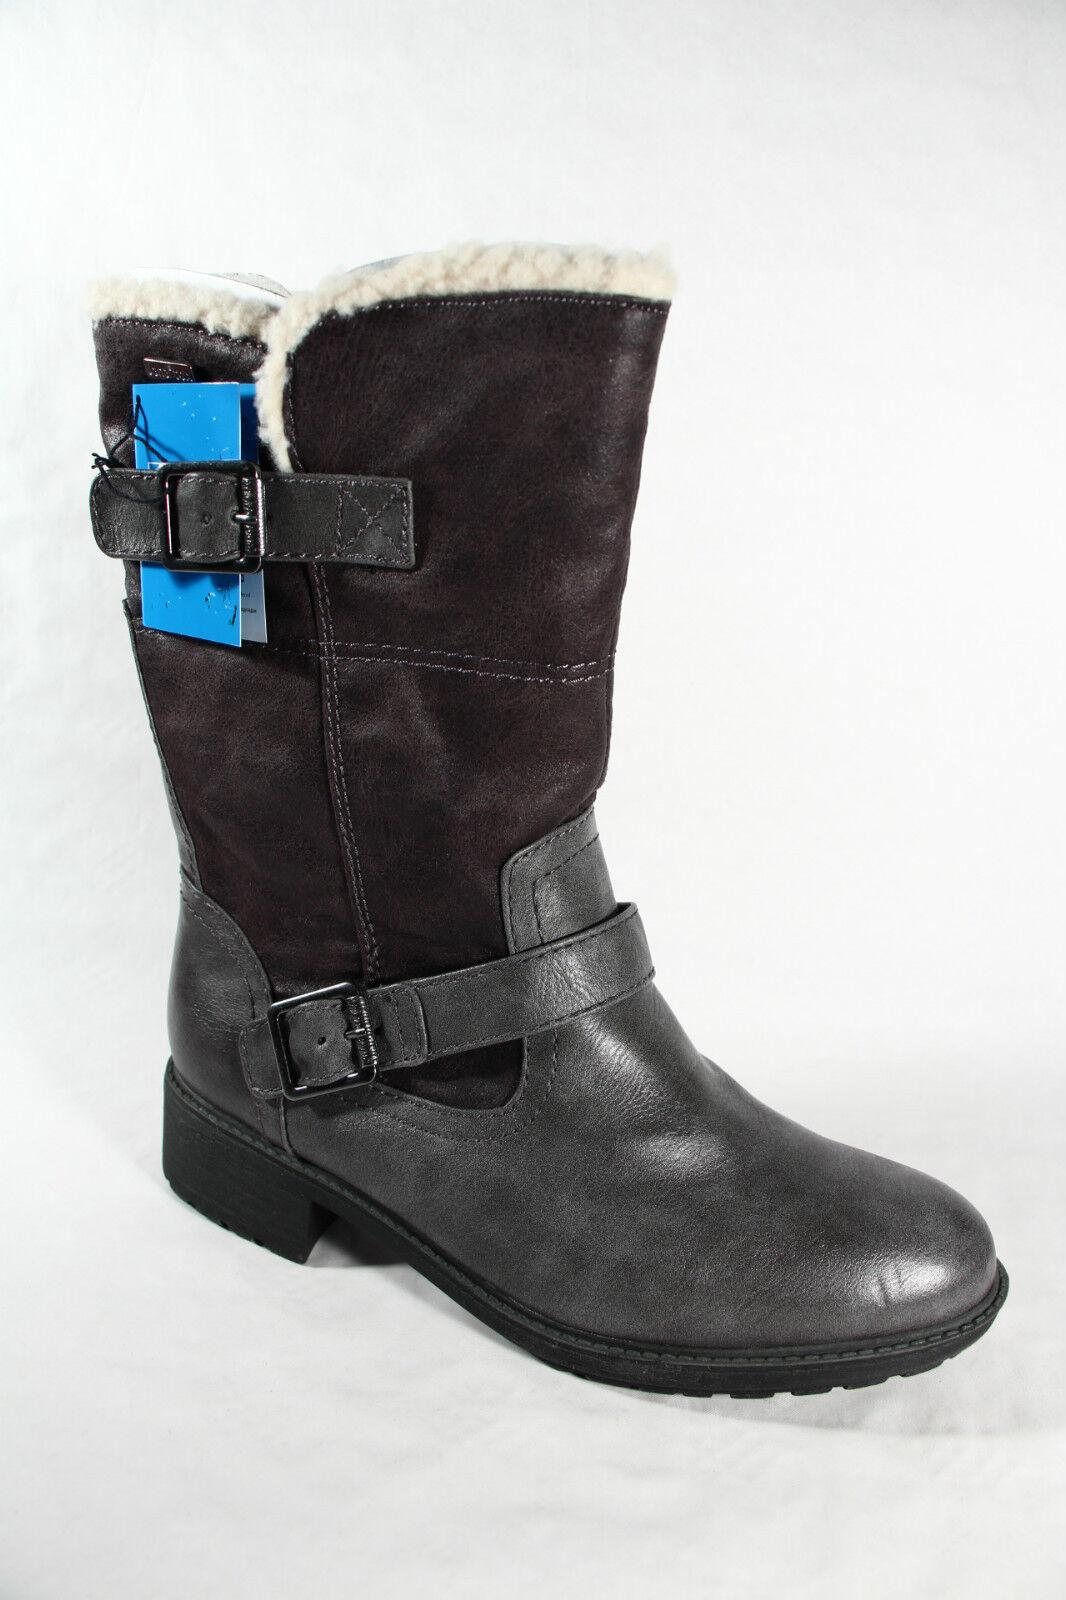 Jana Tex Stiefel, Winterstiefel, Stiefel NEU grau, Warmfutter; Profilsohle RV26441 NEU Stiefel f90d19